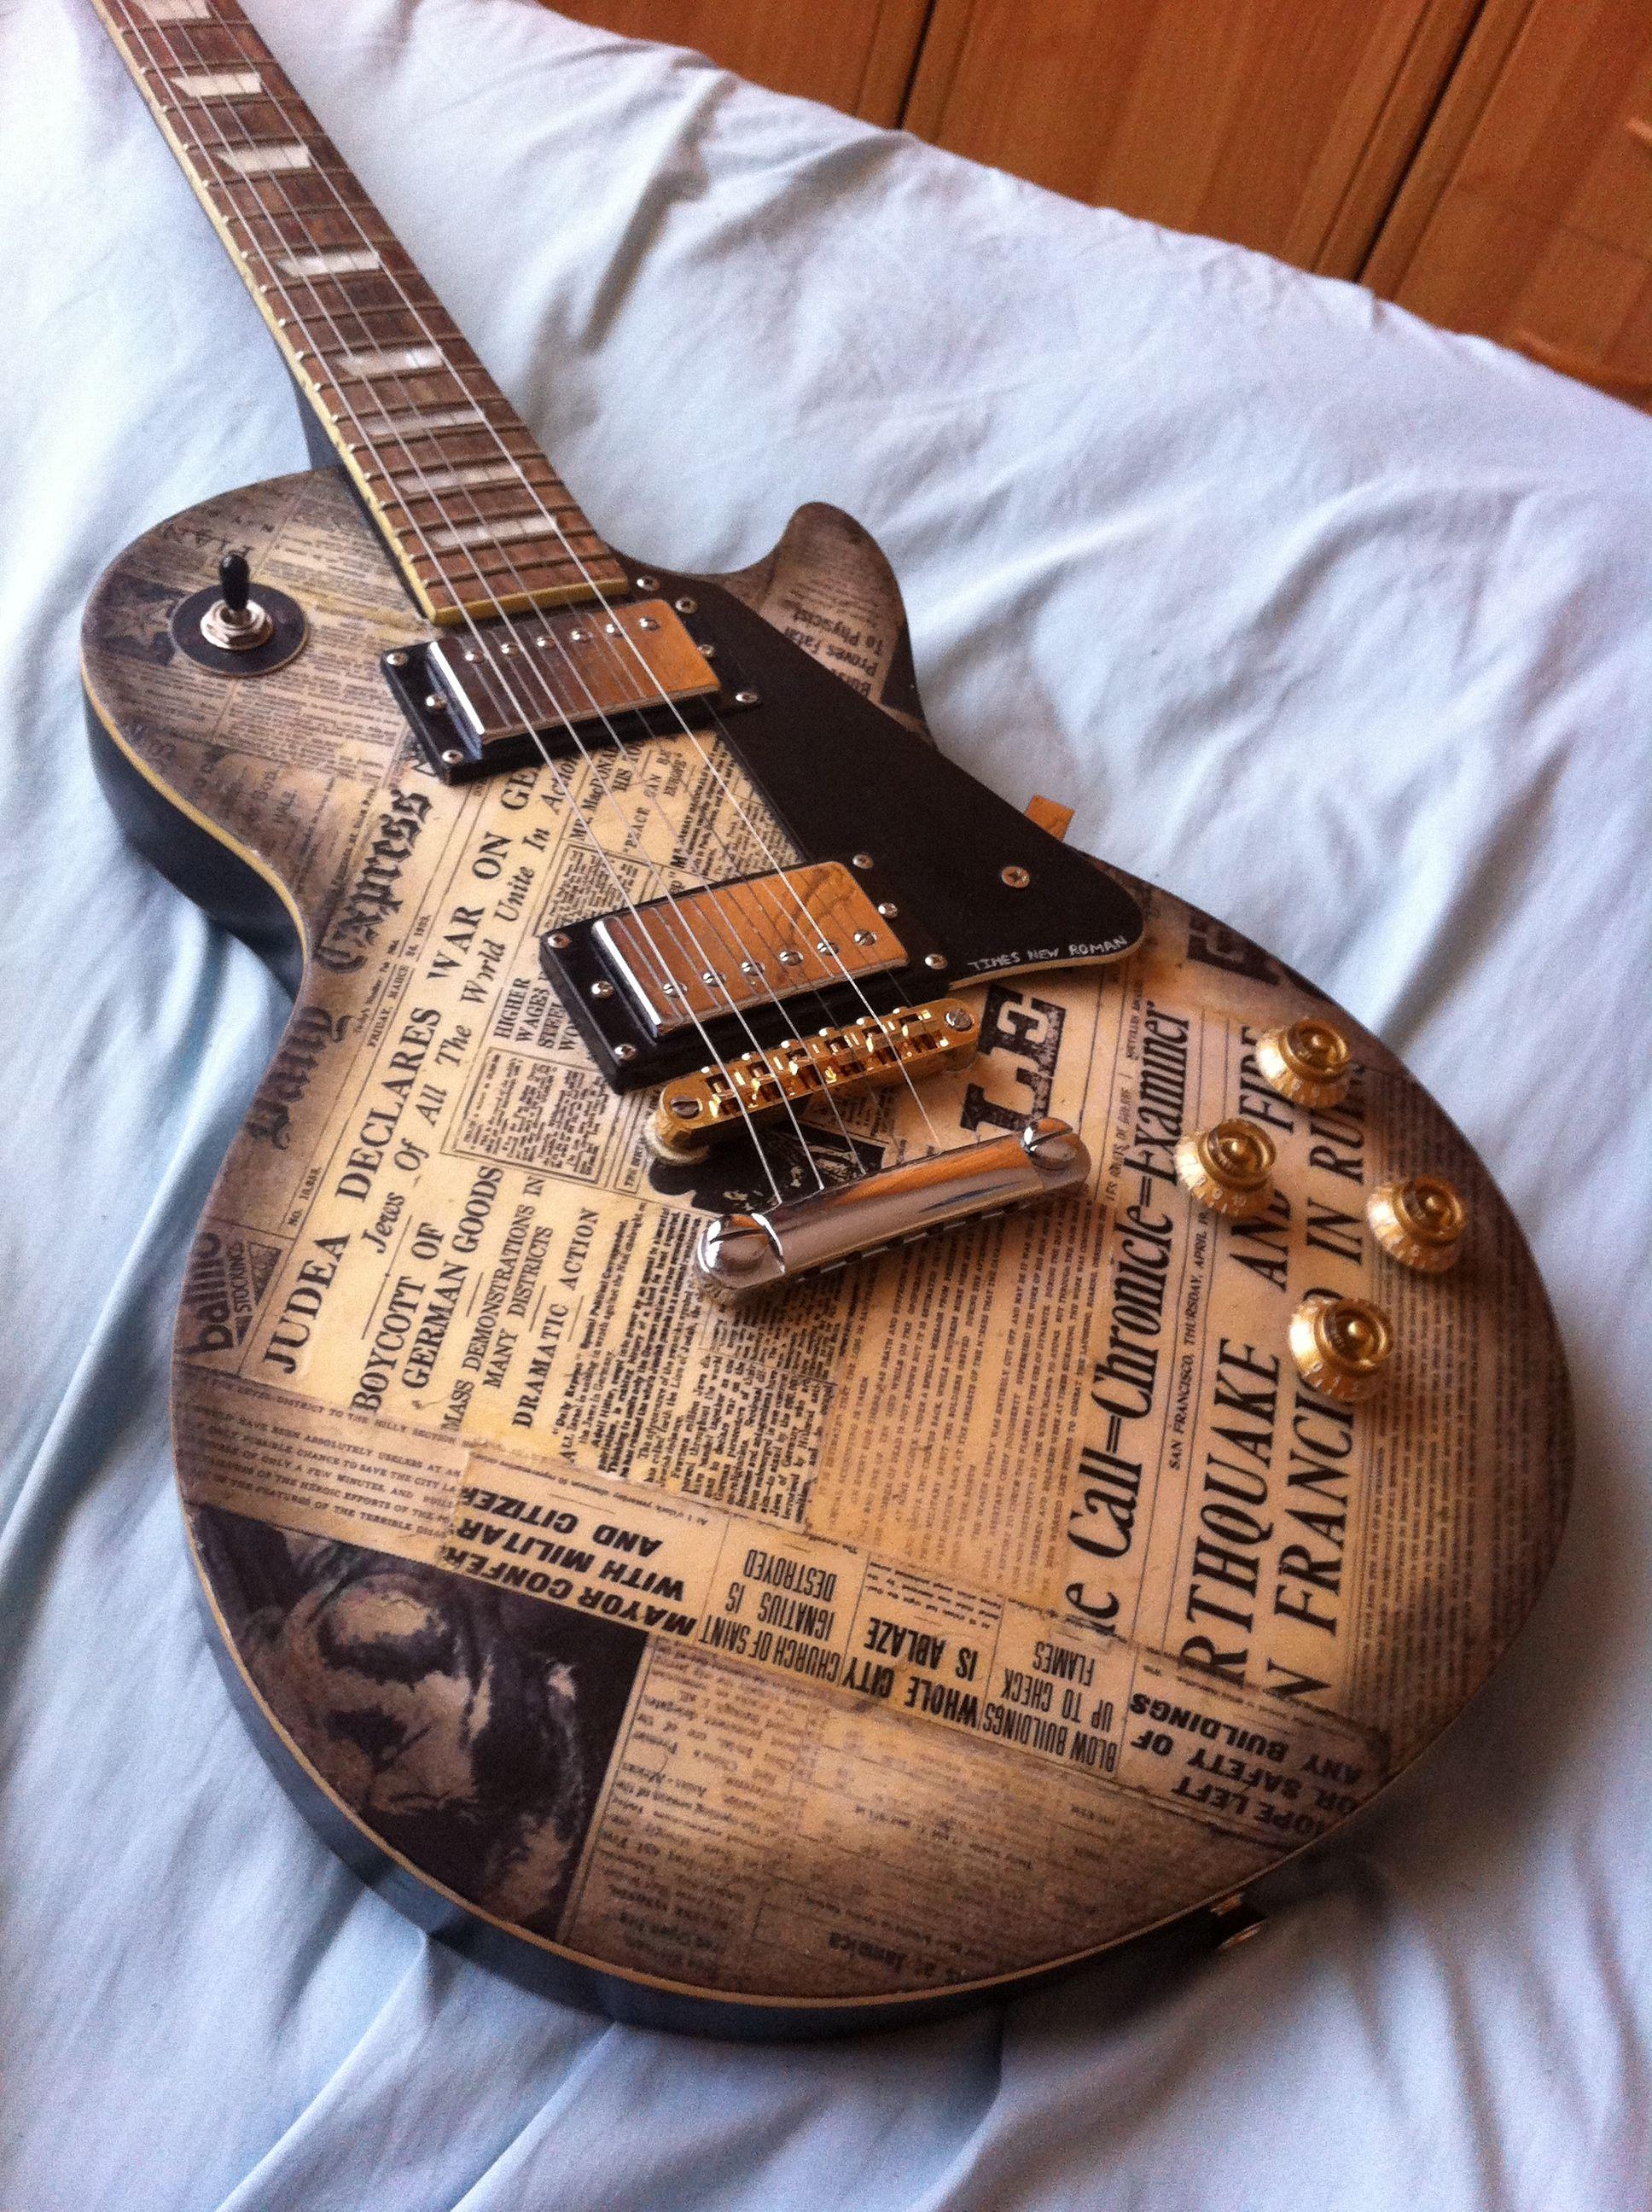 diy guitar newspaper finish guitar diy musical instruments guitar gibson guitars music. Black Bedroom Furniture Sets. Home Design Ideas